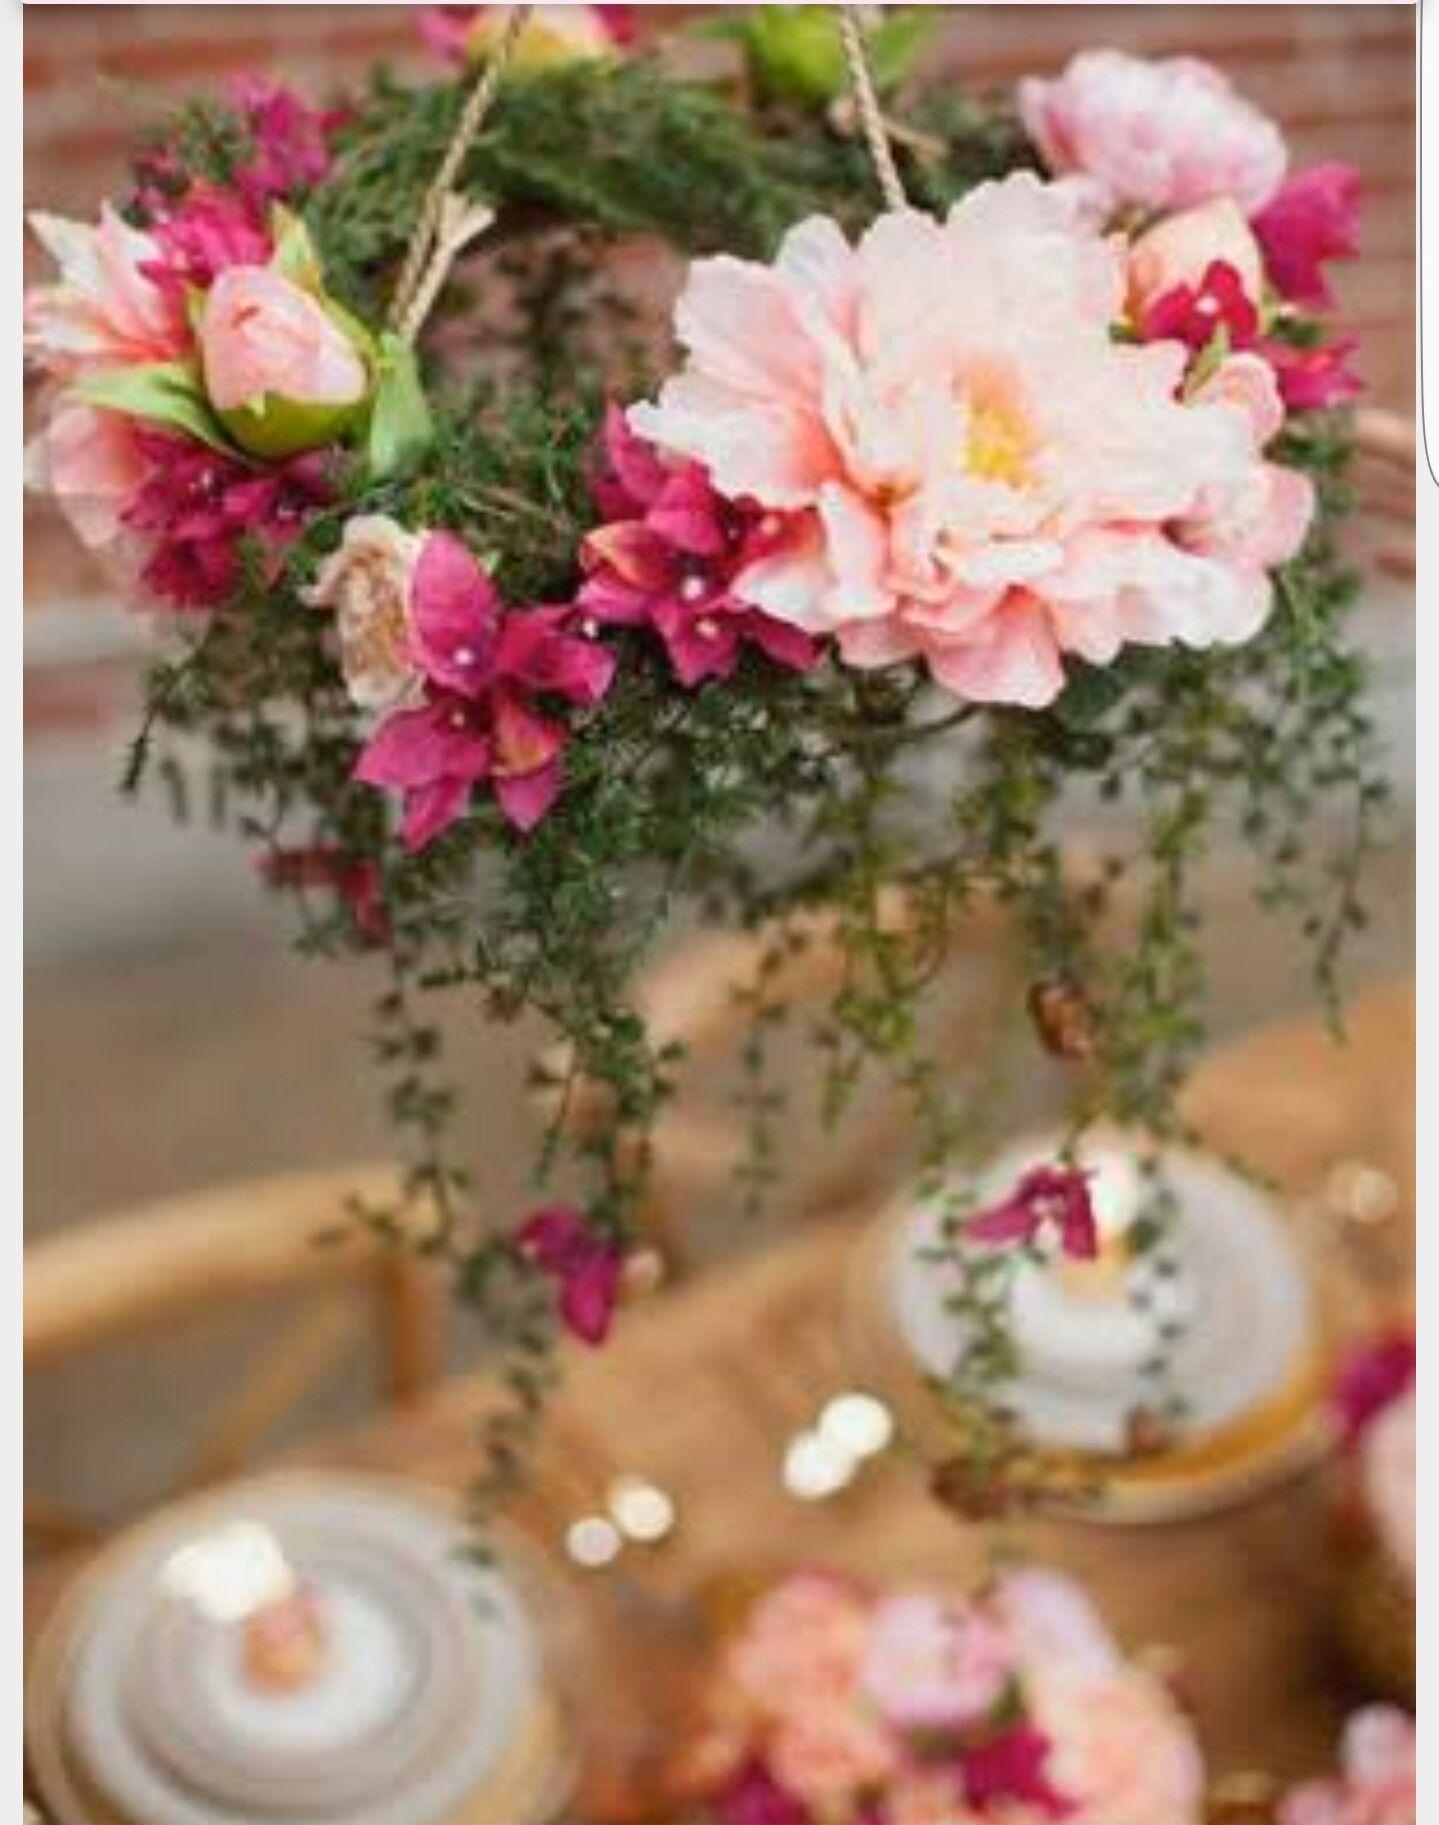 Hanging Flowers Romantic Bride Pinterest Hanging Flowers